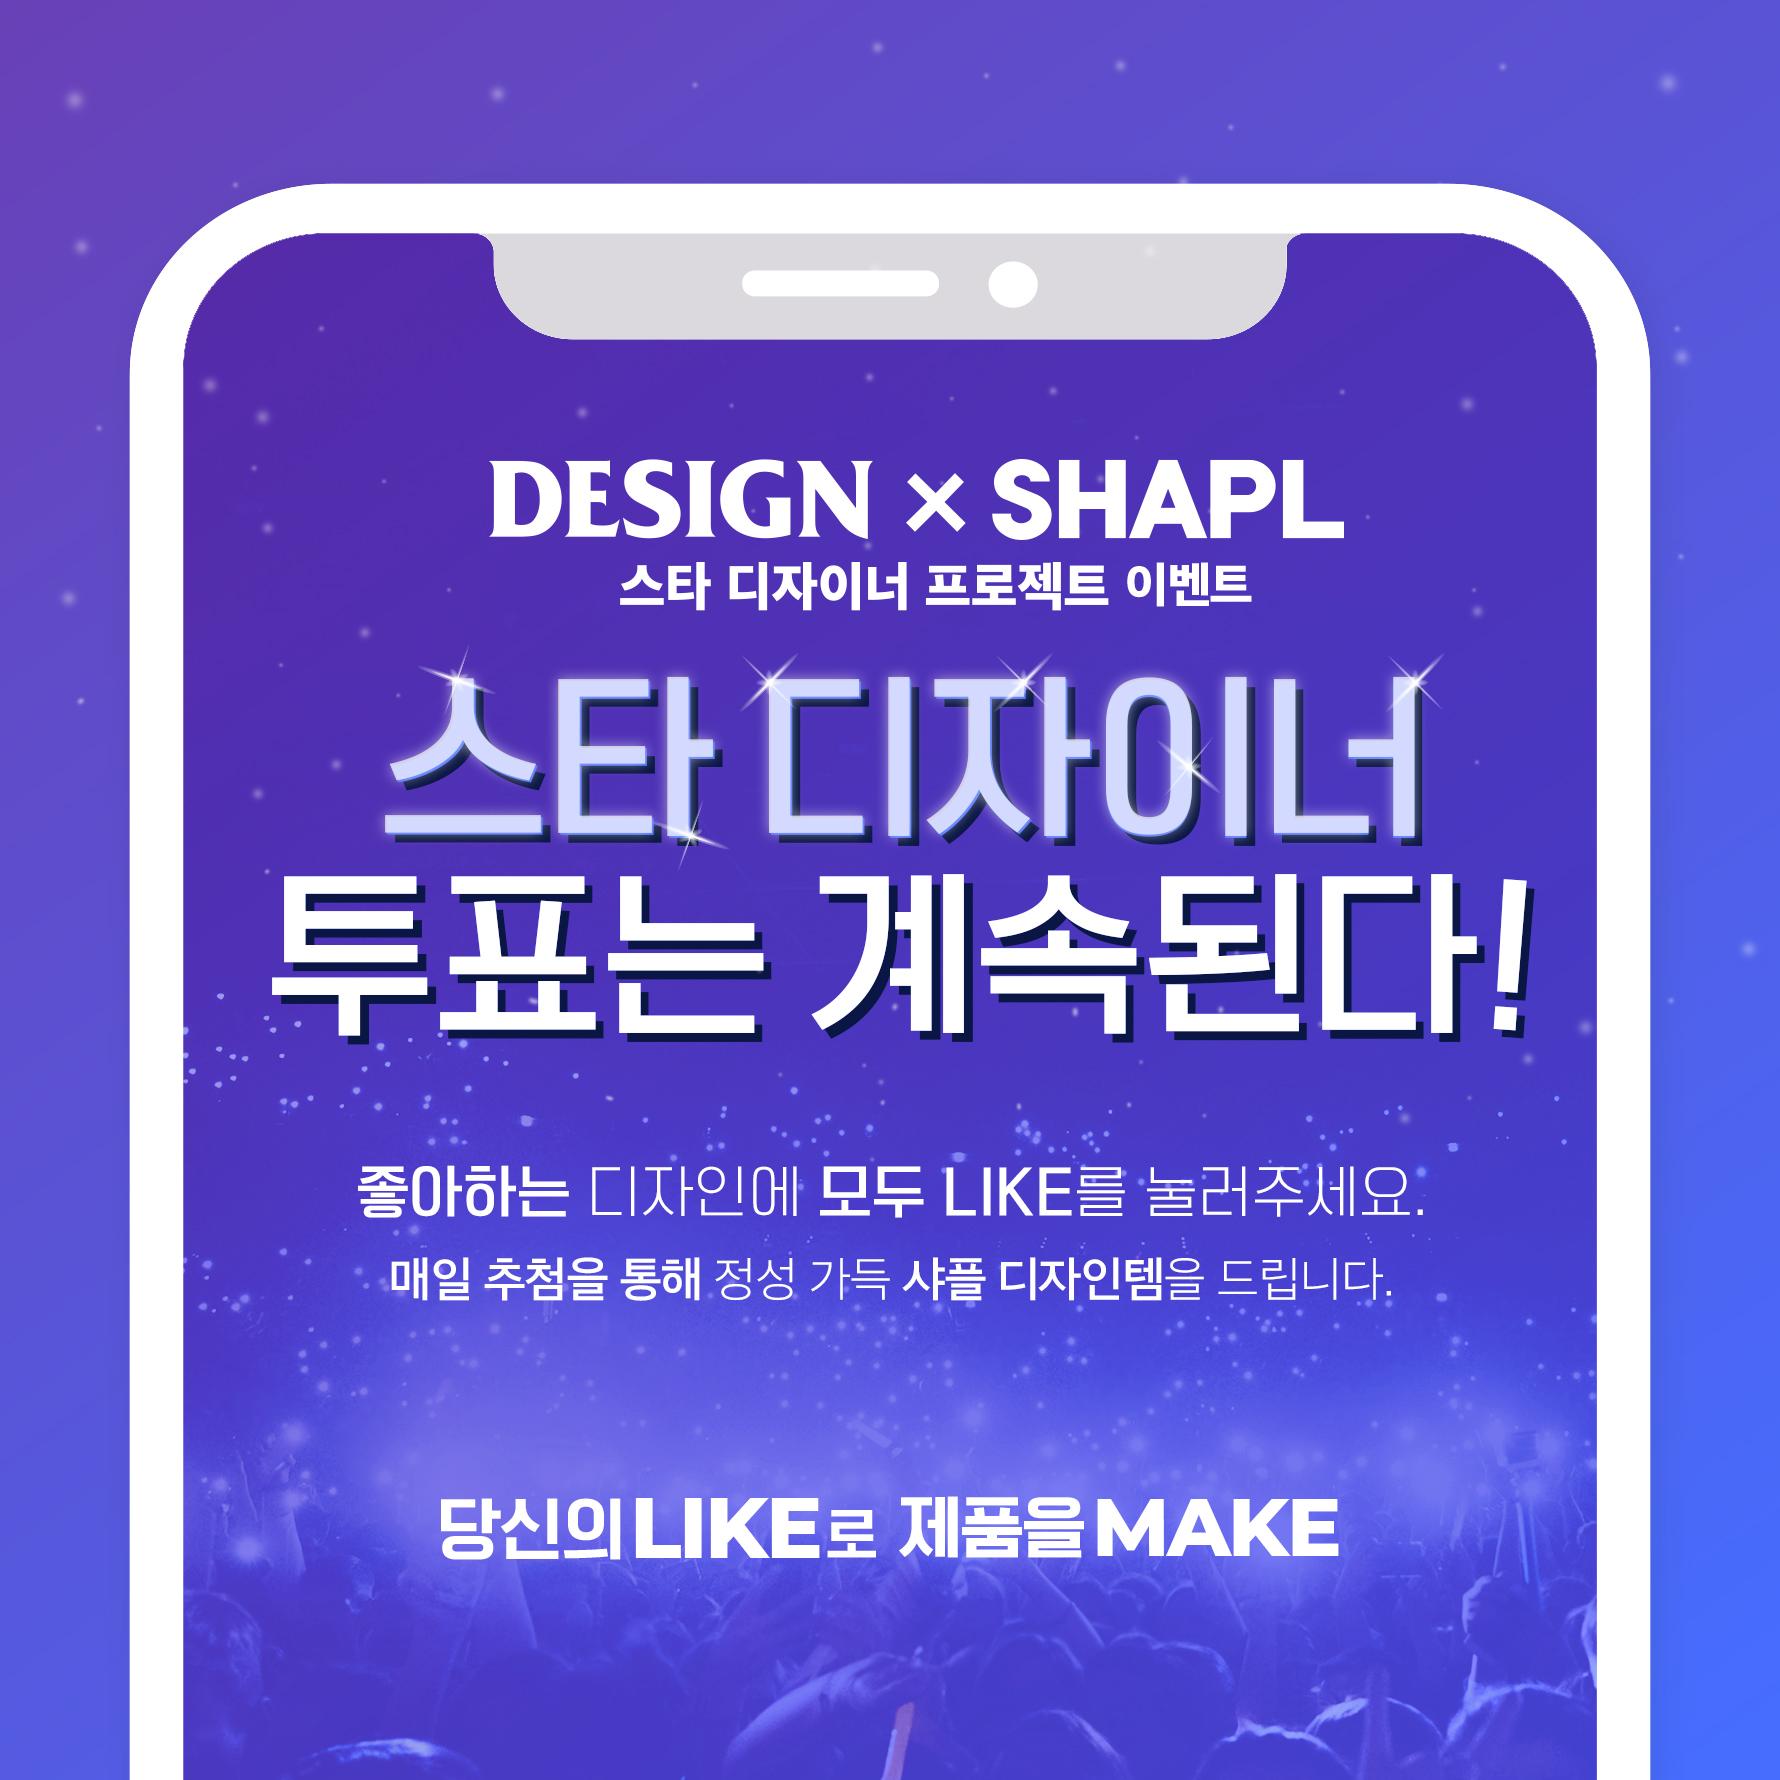 201901/SDF_SHAPL_Stardesign_Voting_181227_최종2.jpg